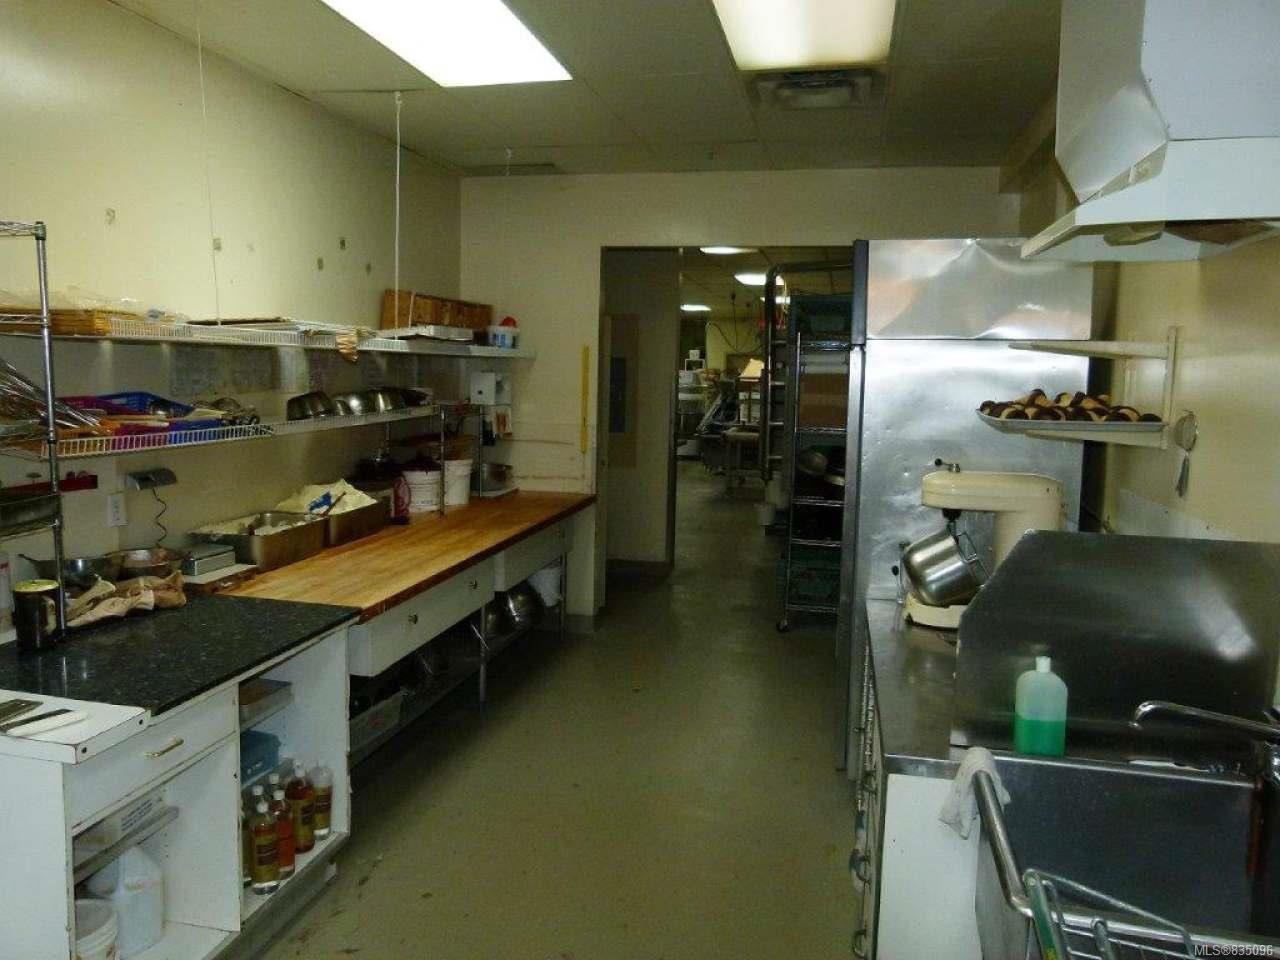 Photo 12: Photos: 2025 Bowen Rd in NANAIMO: Na Central Nanaimo Mixed Use for sale (Nanaimo)  : MLS®# 835096